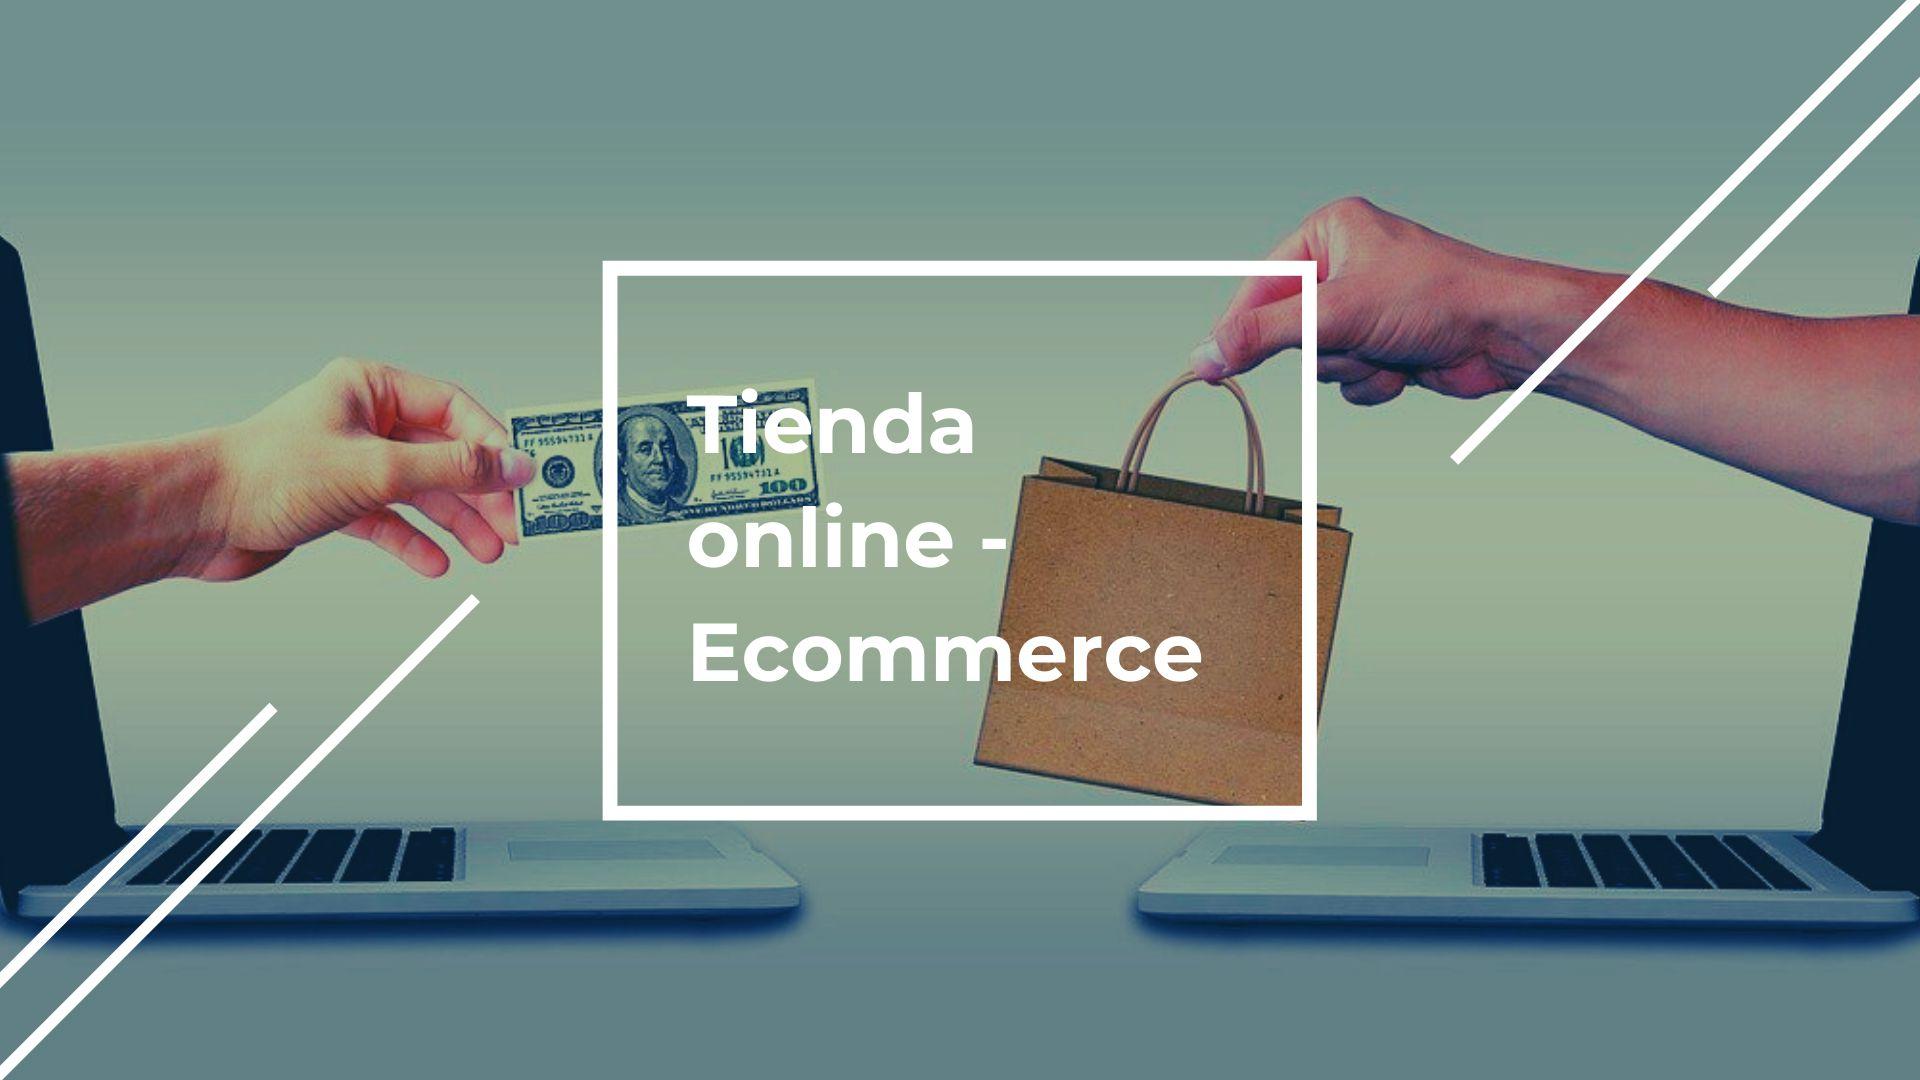 Empresa de tiendas online ecommerce - Software Outsourcing Castellana